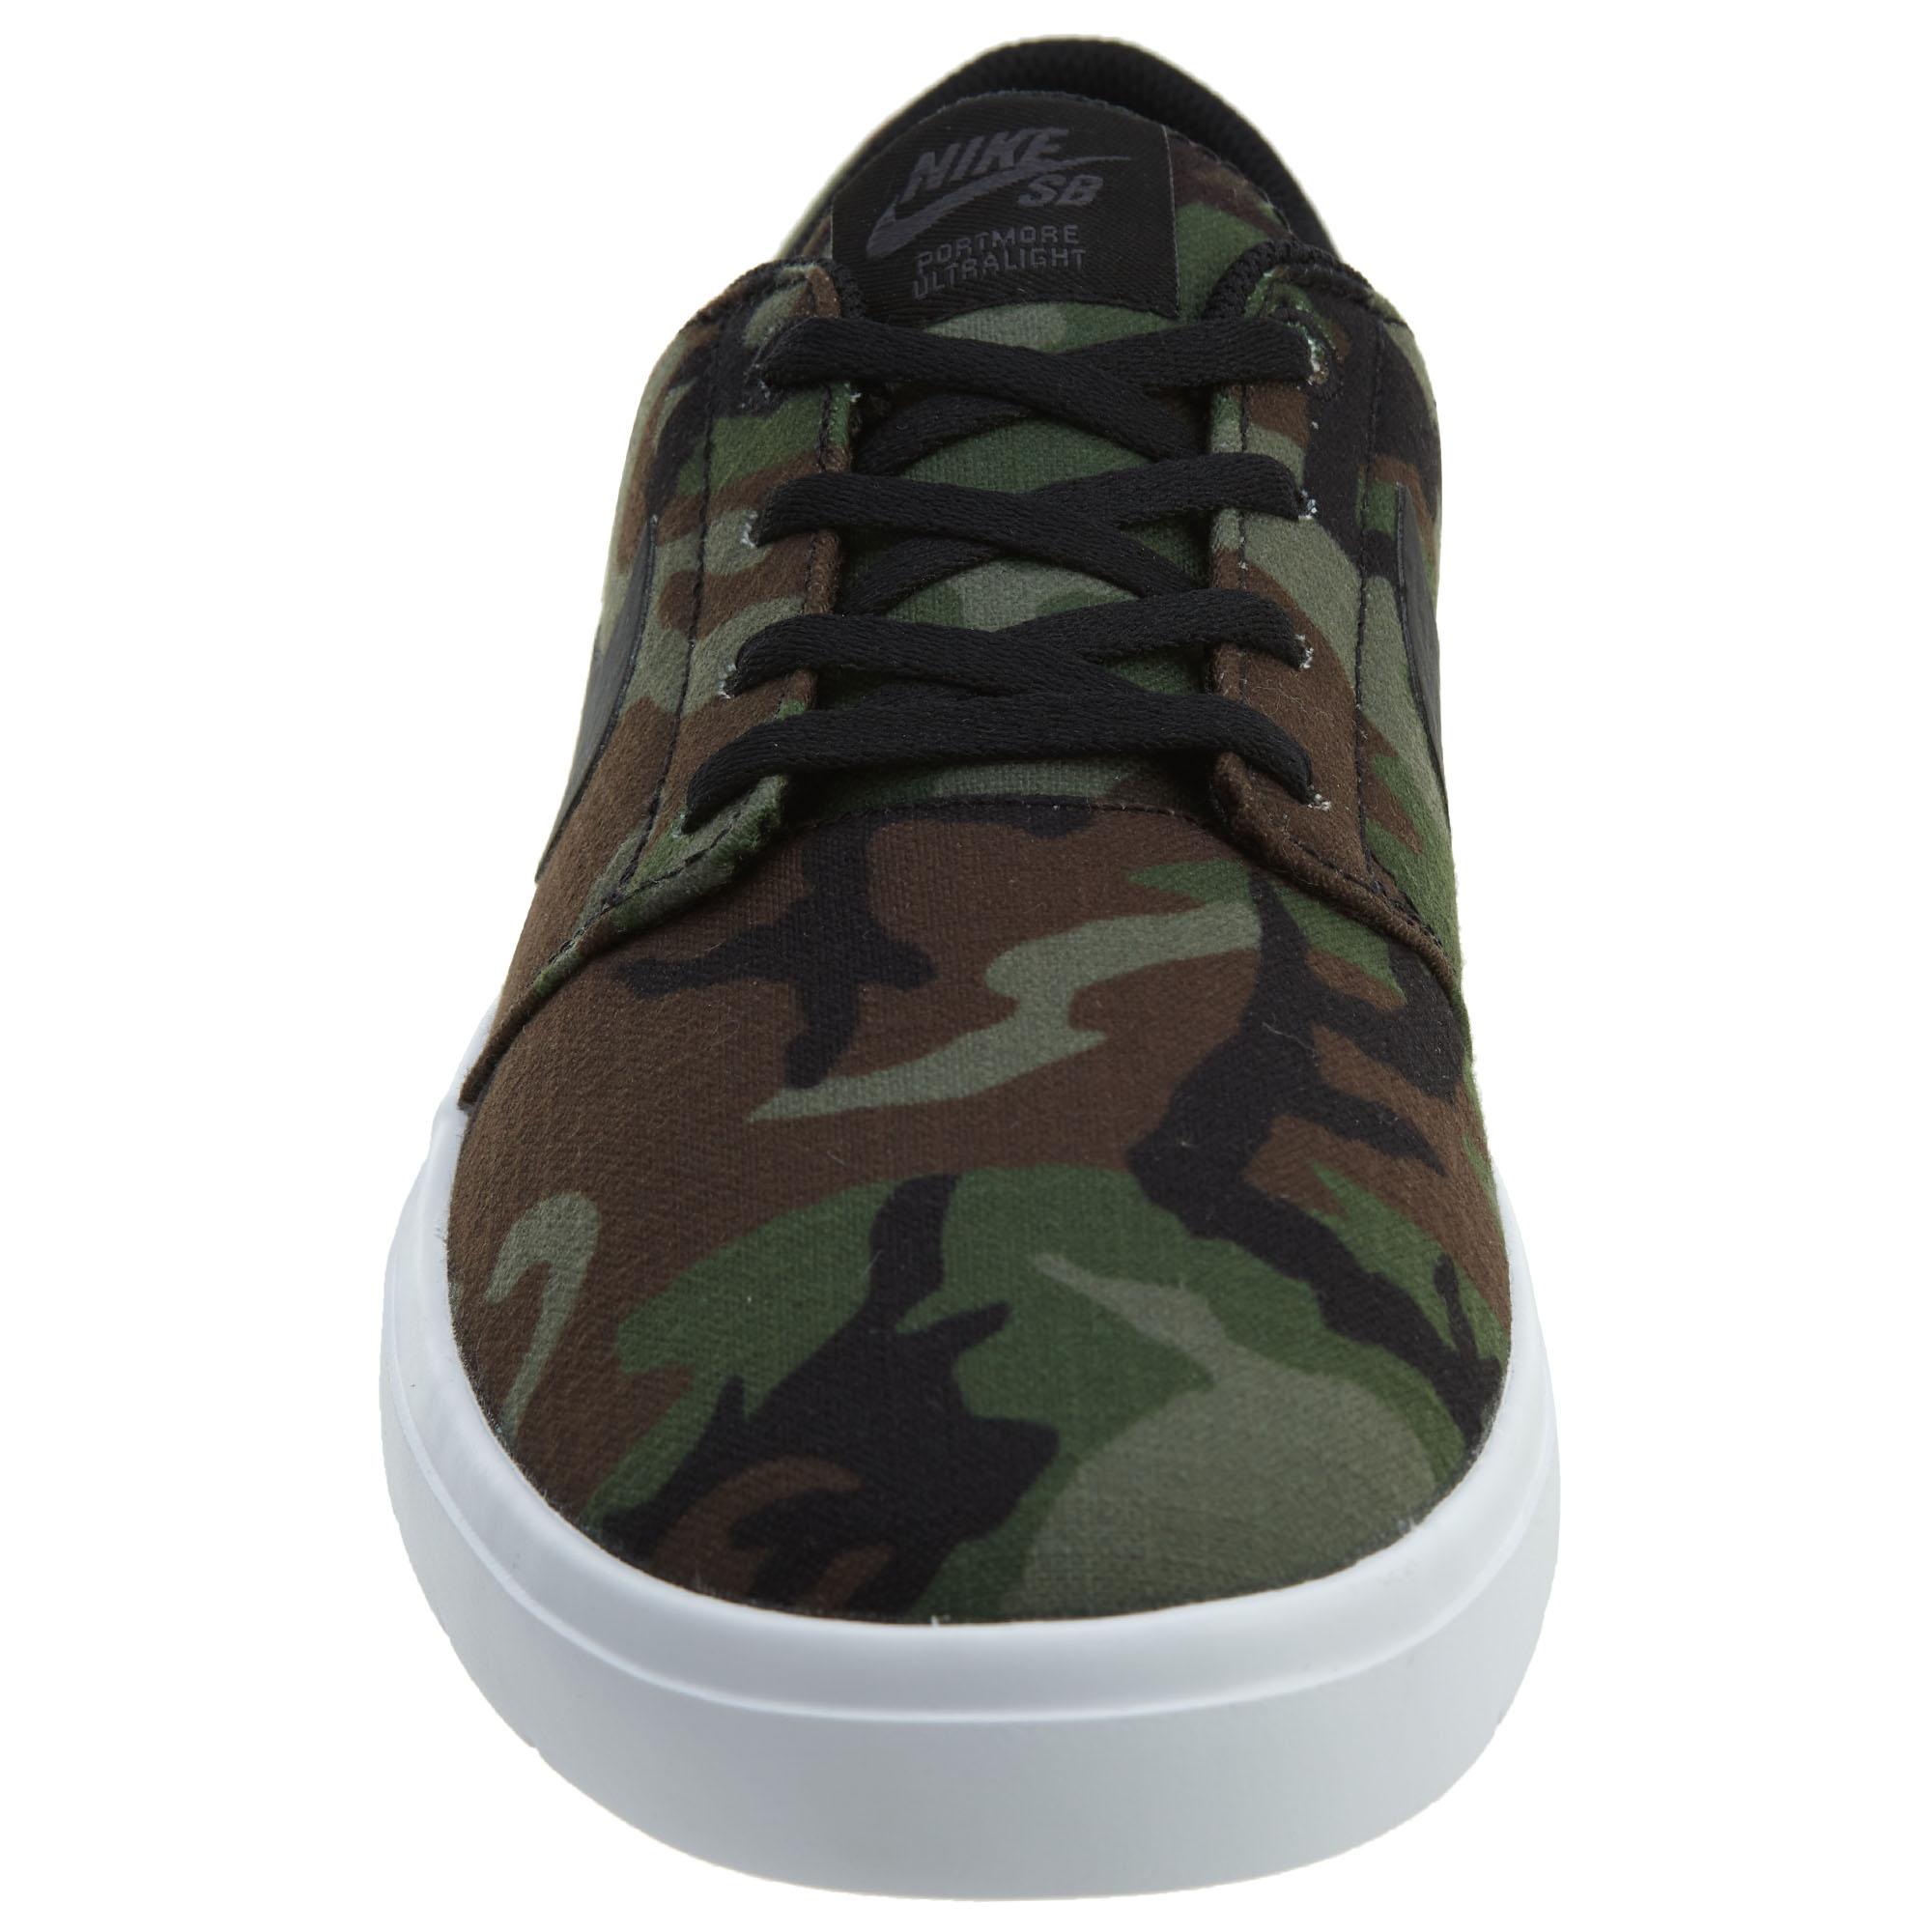 Nike Sb Portmore Ii Ultralight Mens Style : 880271